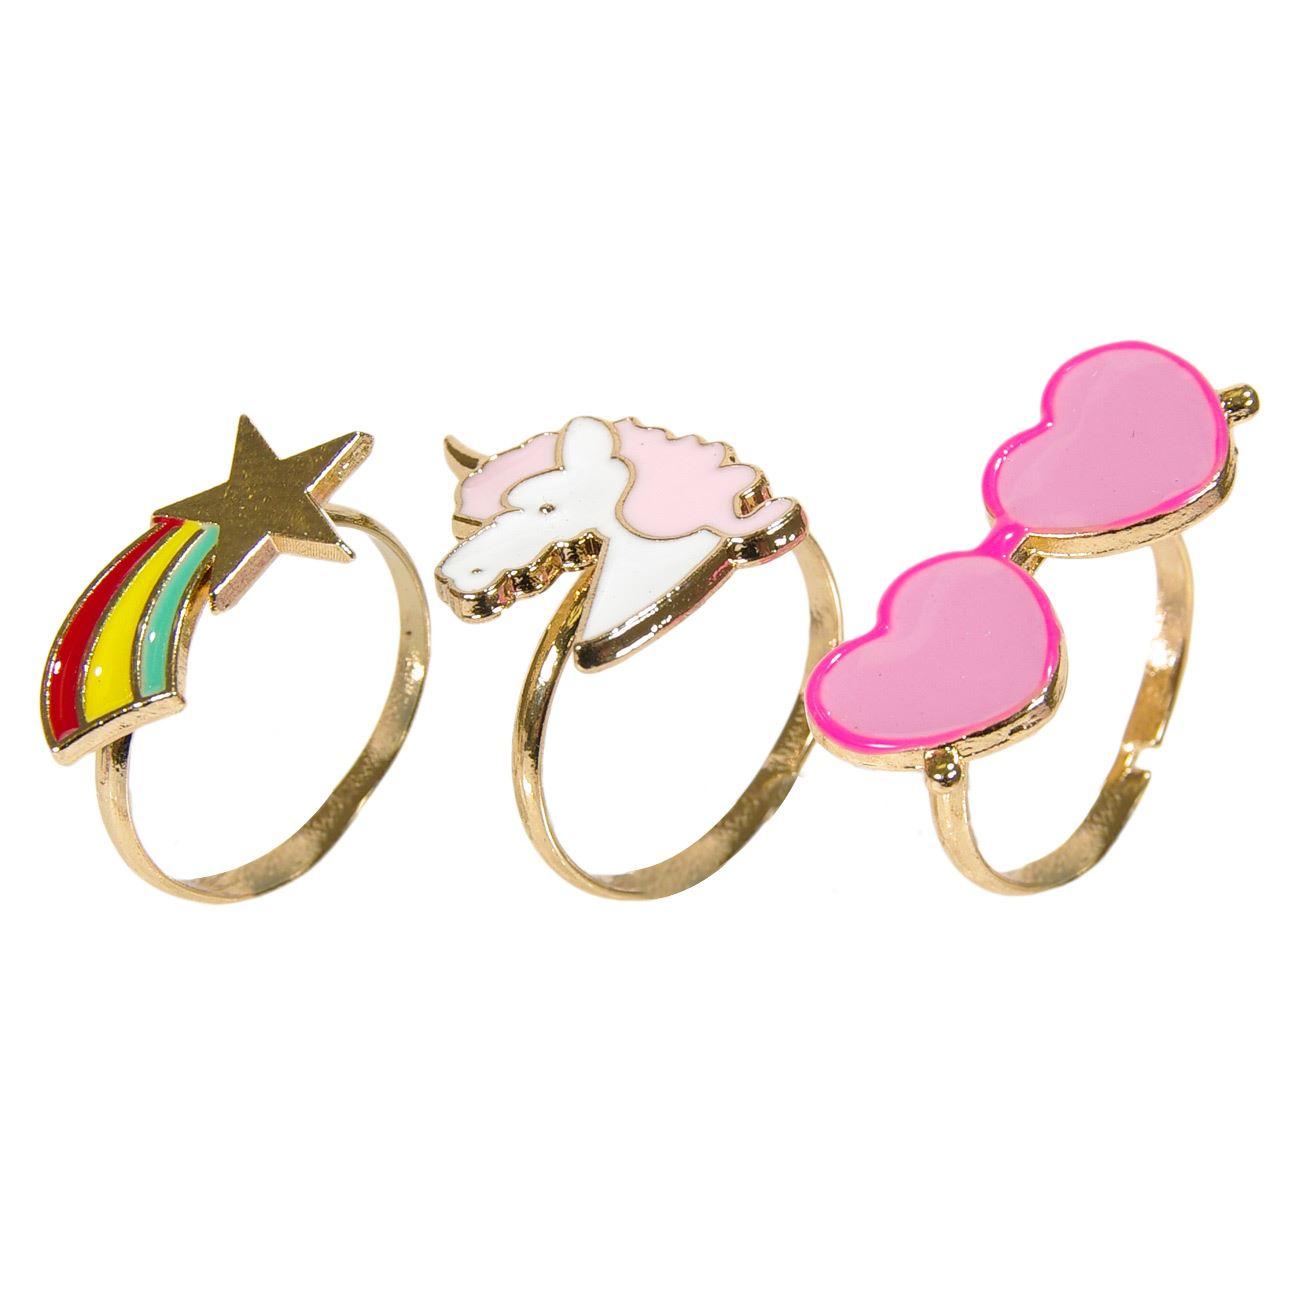 1b10aa1f737 Δαχτυλίδια Παιδικά Γυαλιά Καρδιές Αστέρι Μονόκερος - 3 τμχ.